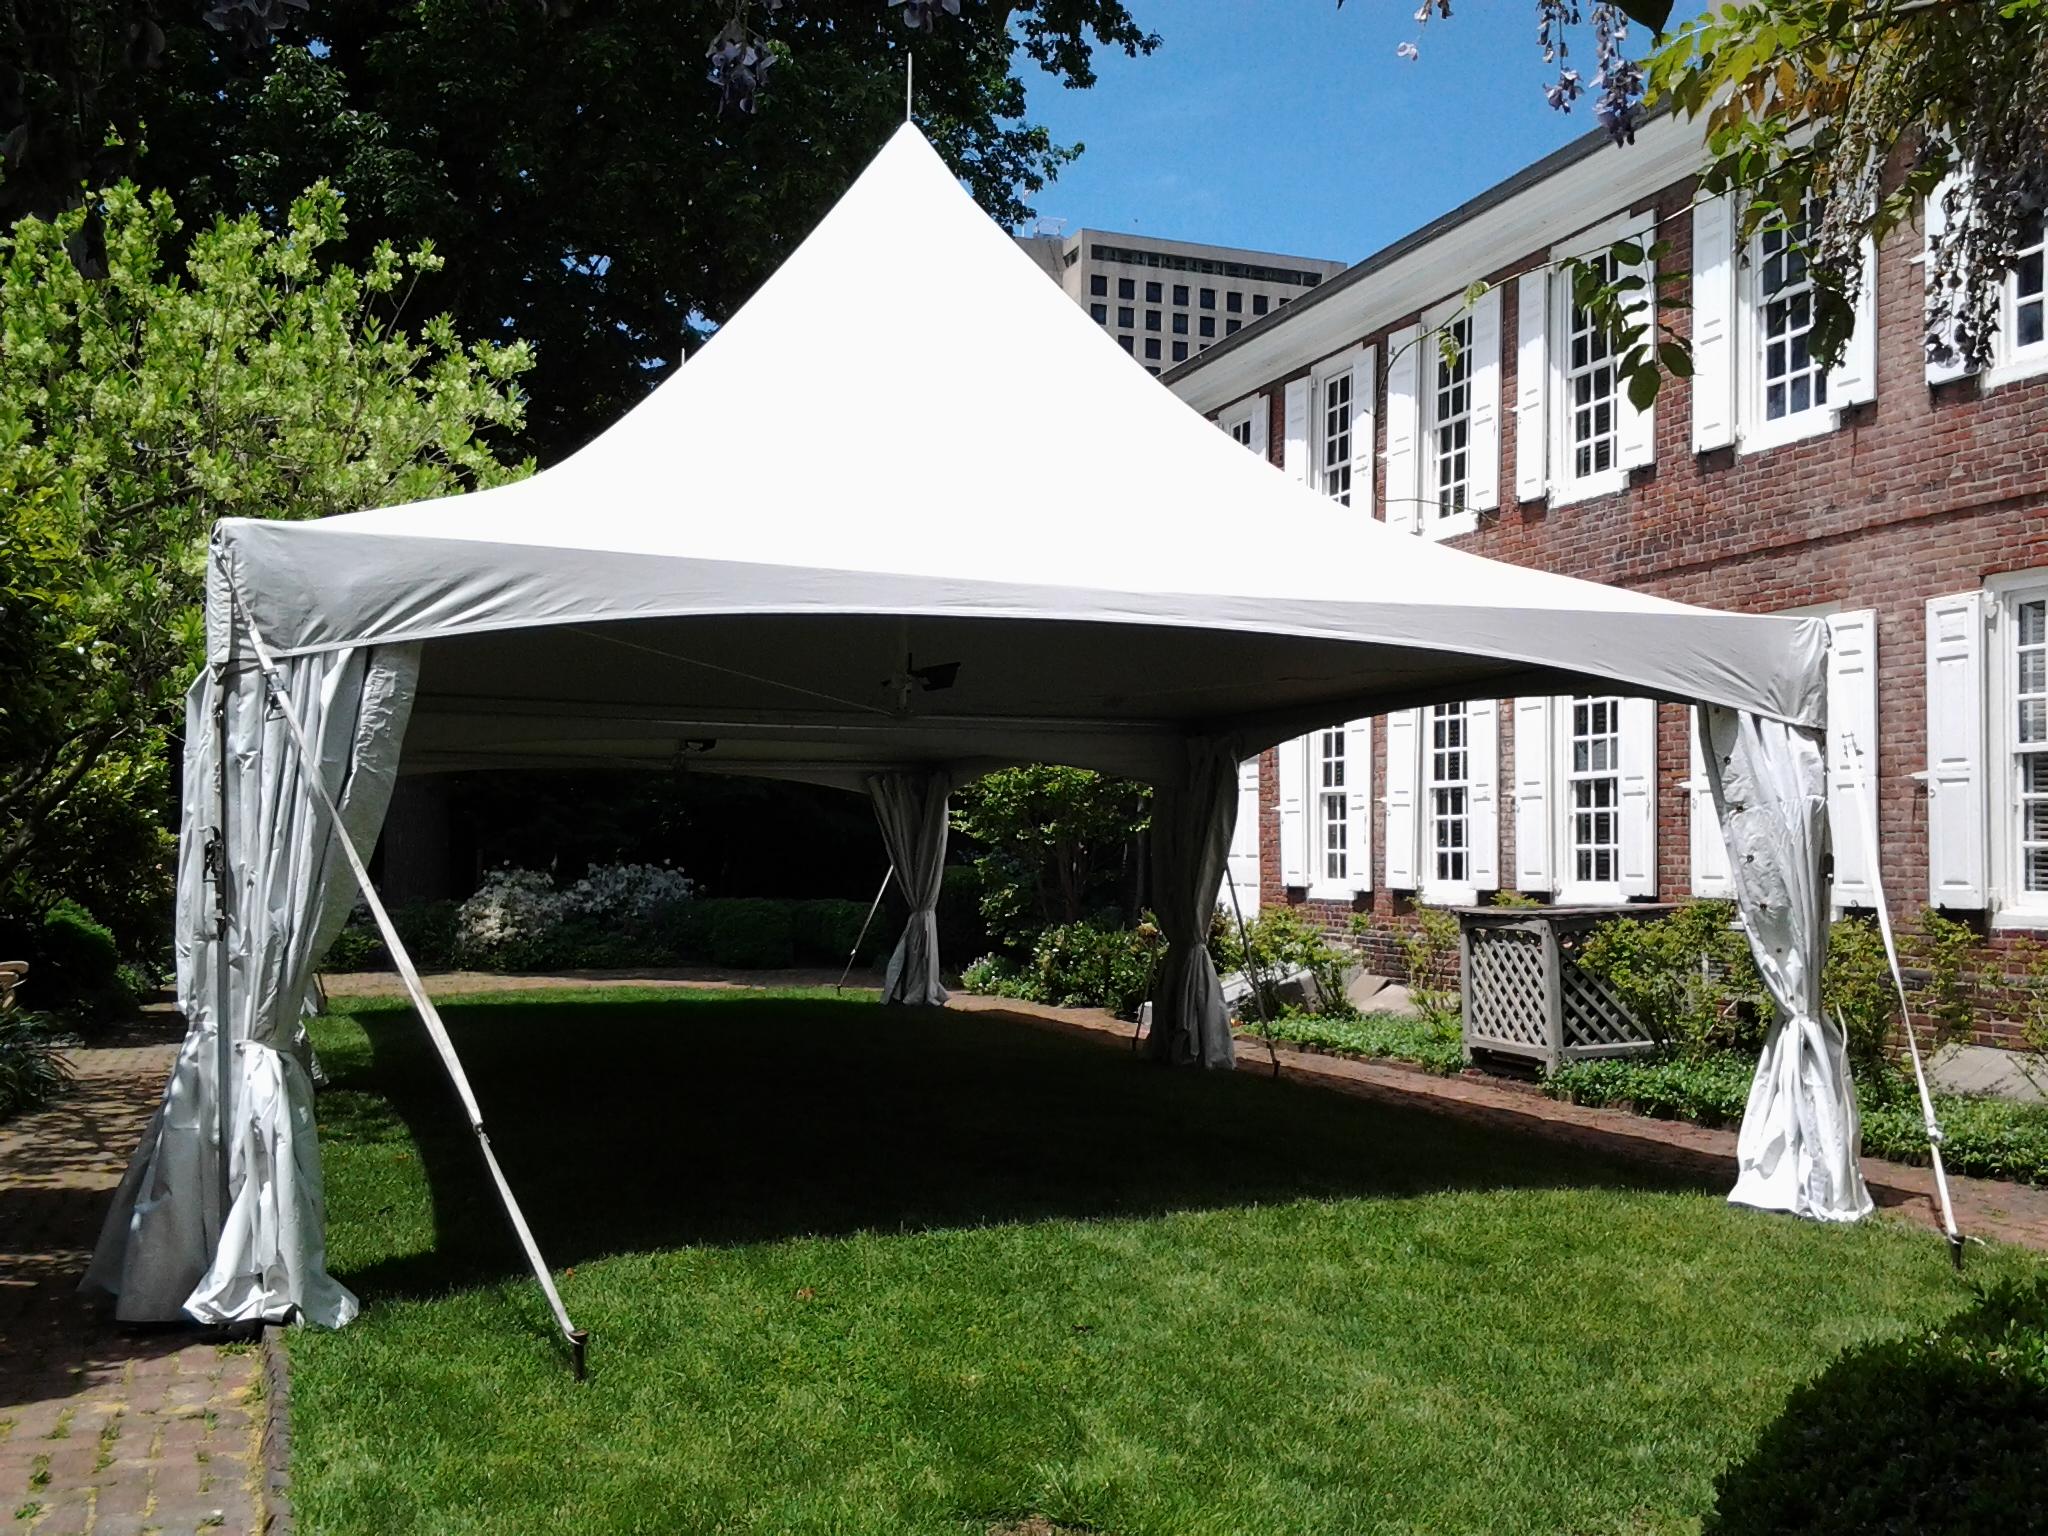 20x20 white frame tent